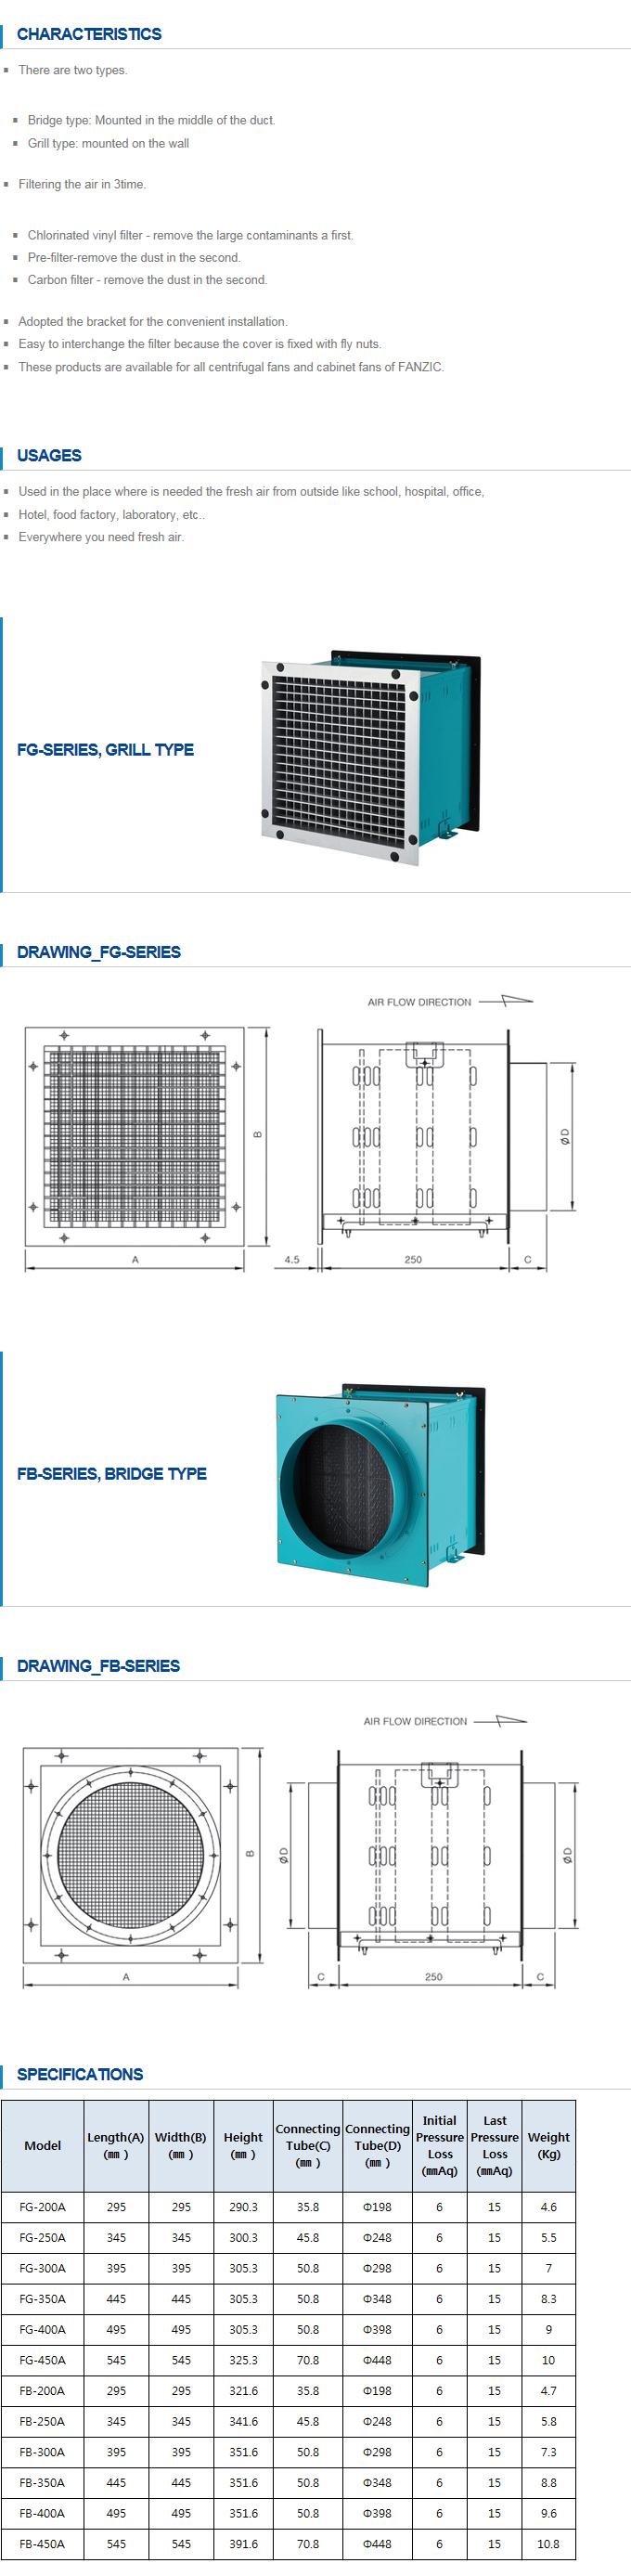 FANZIC Filter Box (Fandora) / Accessory FG/FB Series